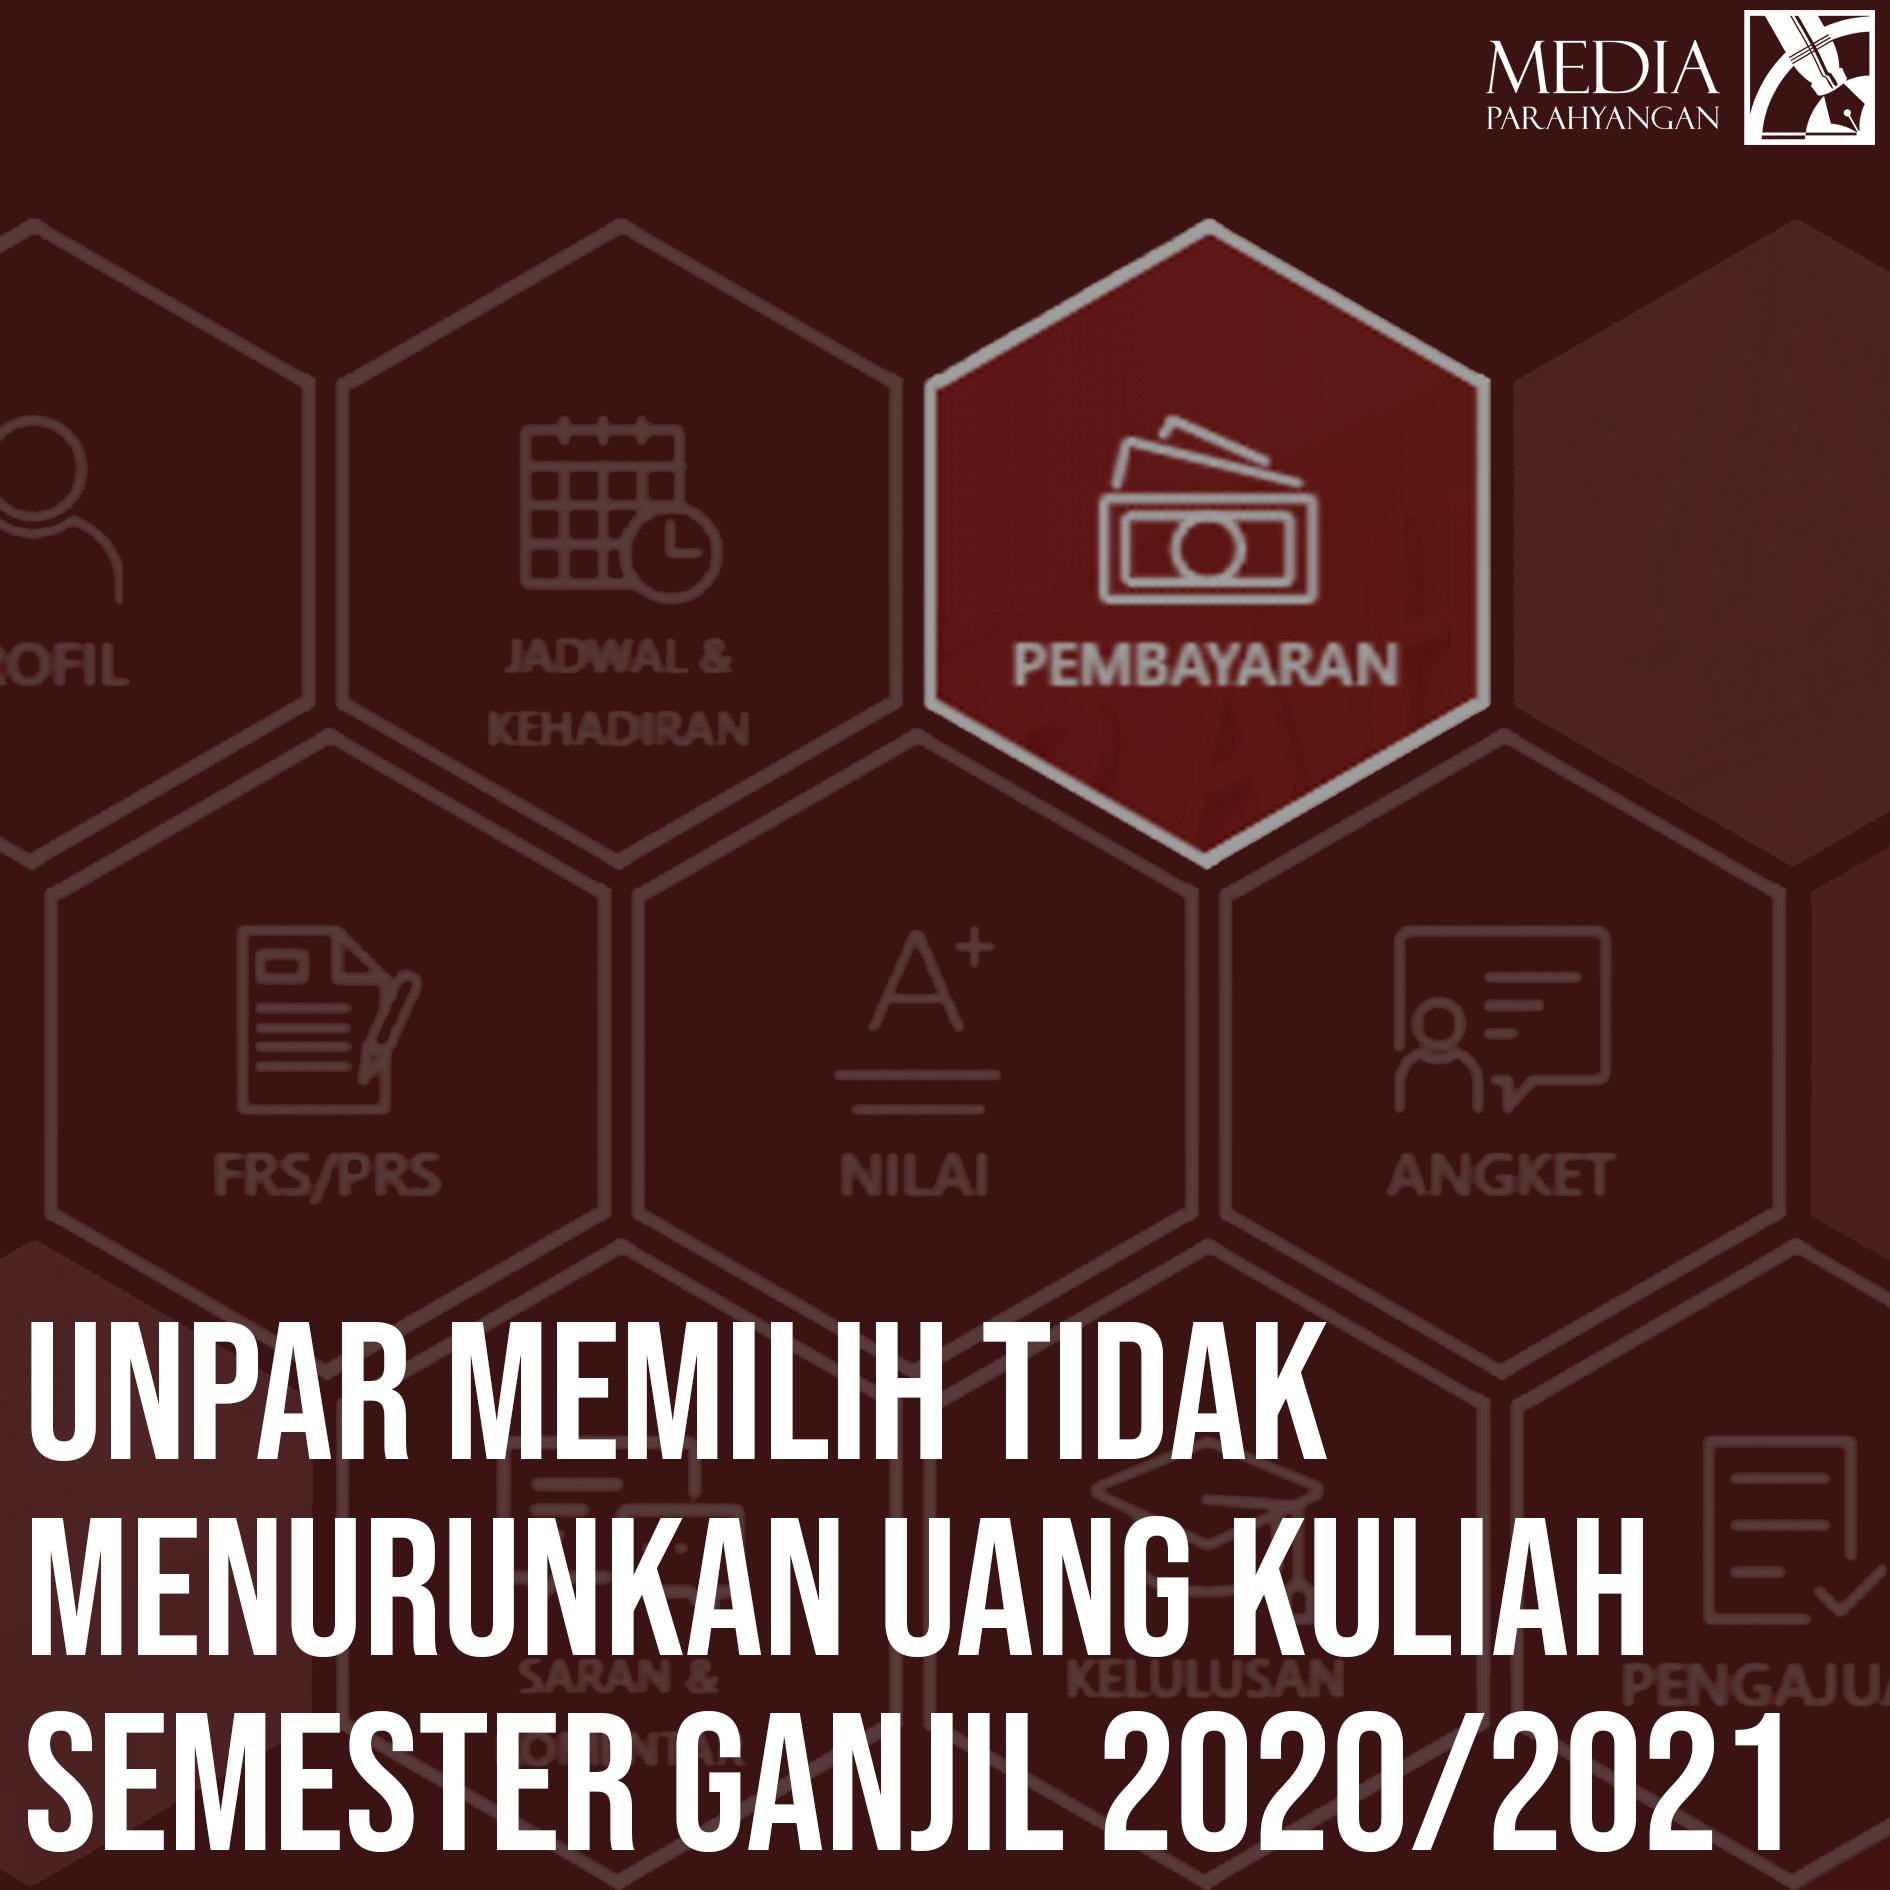 Unpar Memilih Tidak Menurunkan Uang Kuliah Semester Ganjil 2020/2021